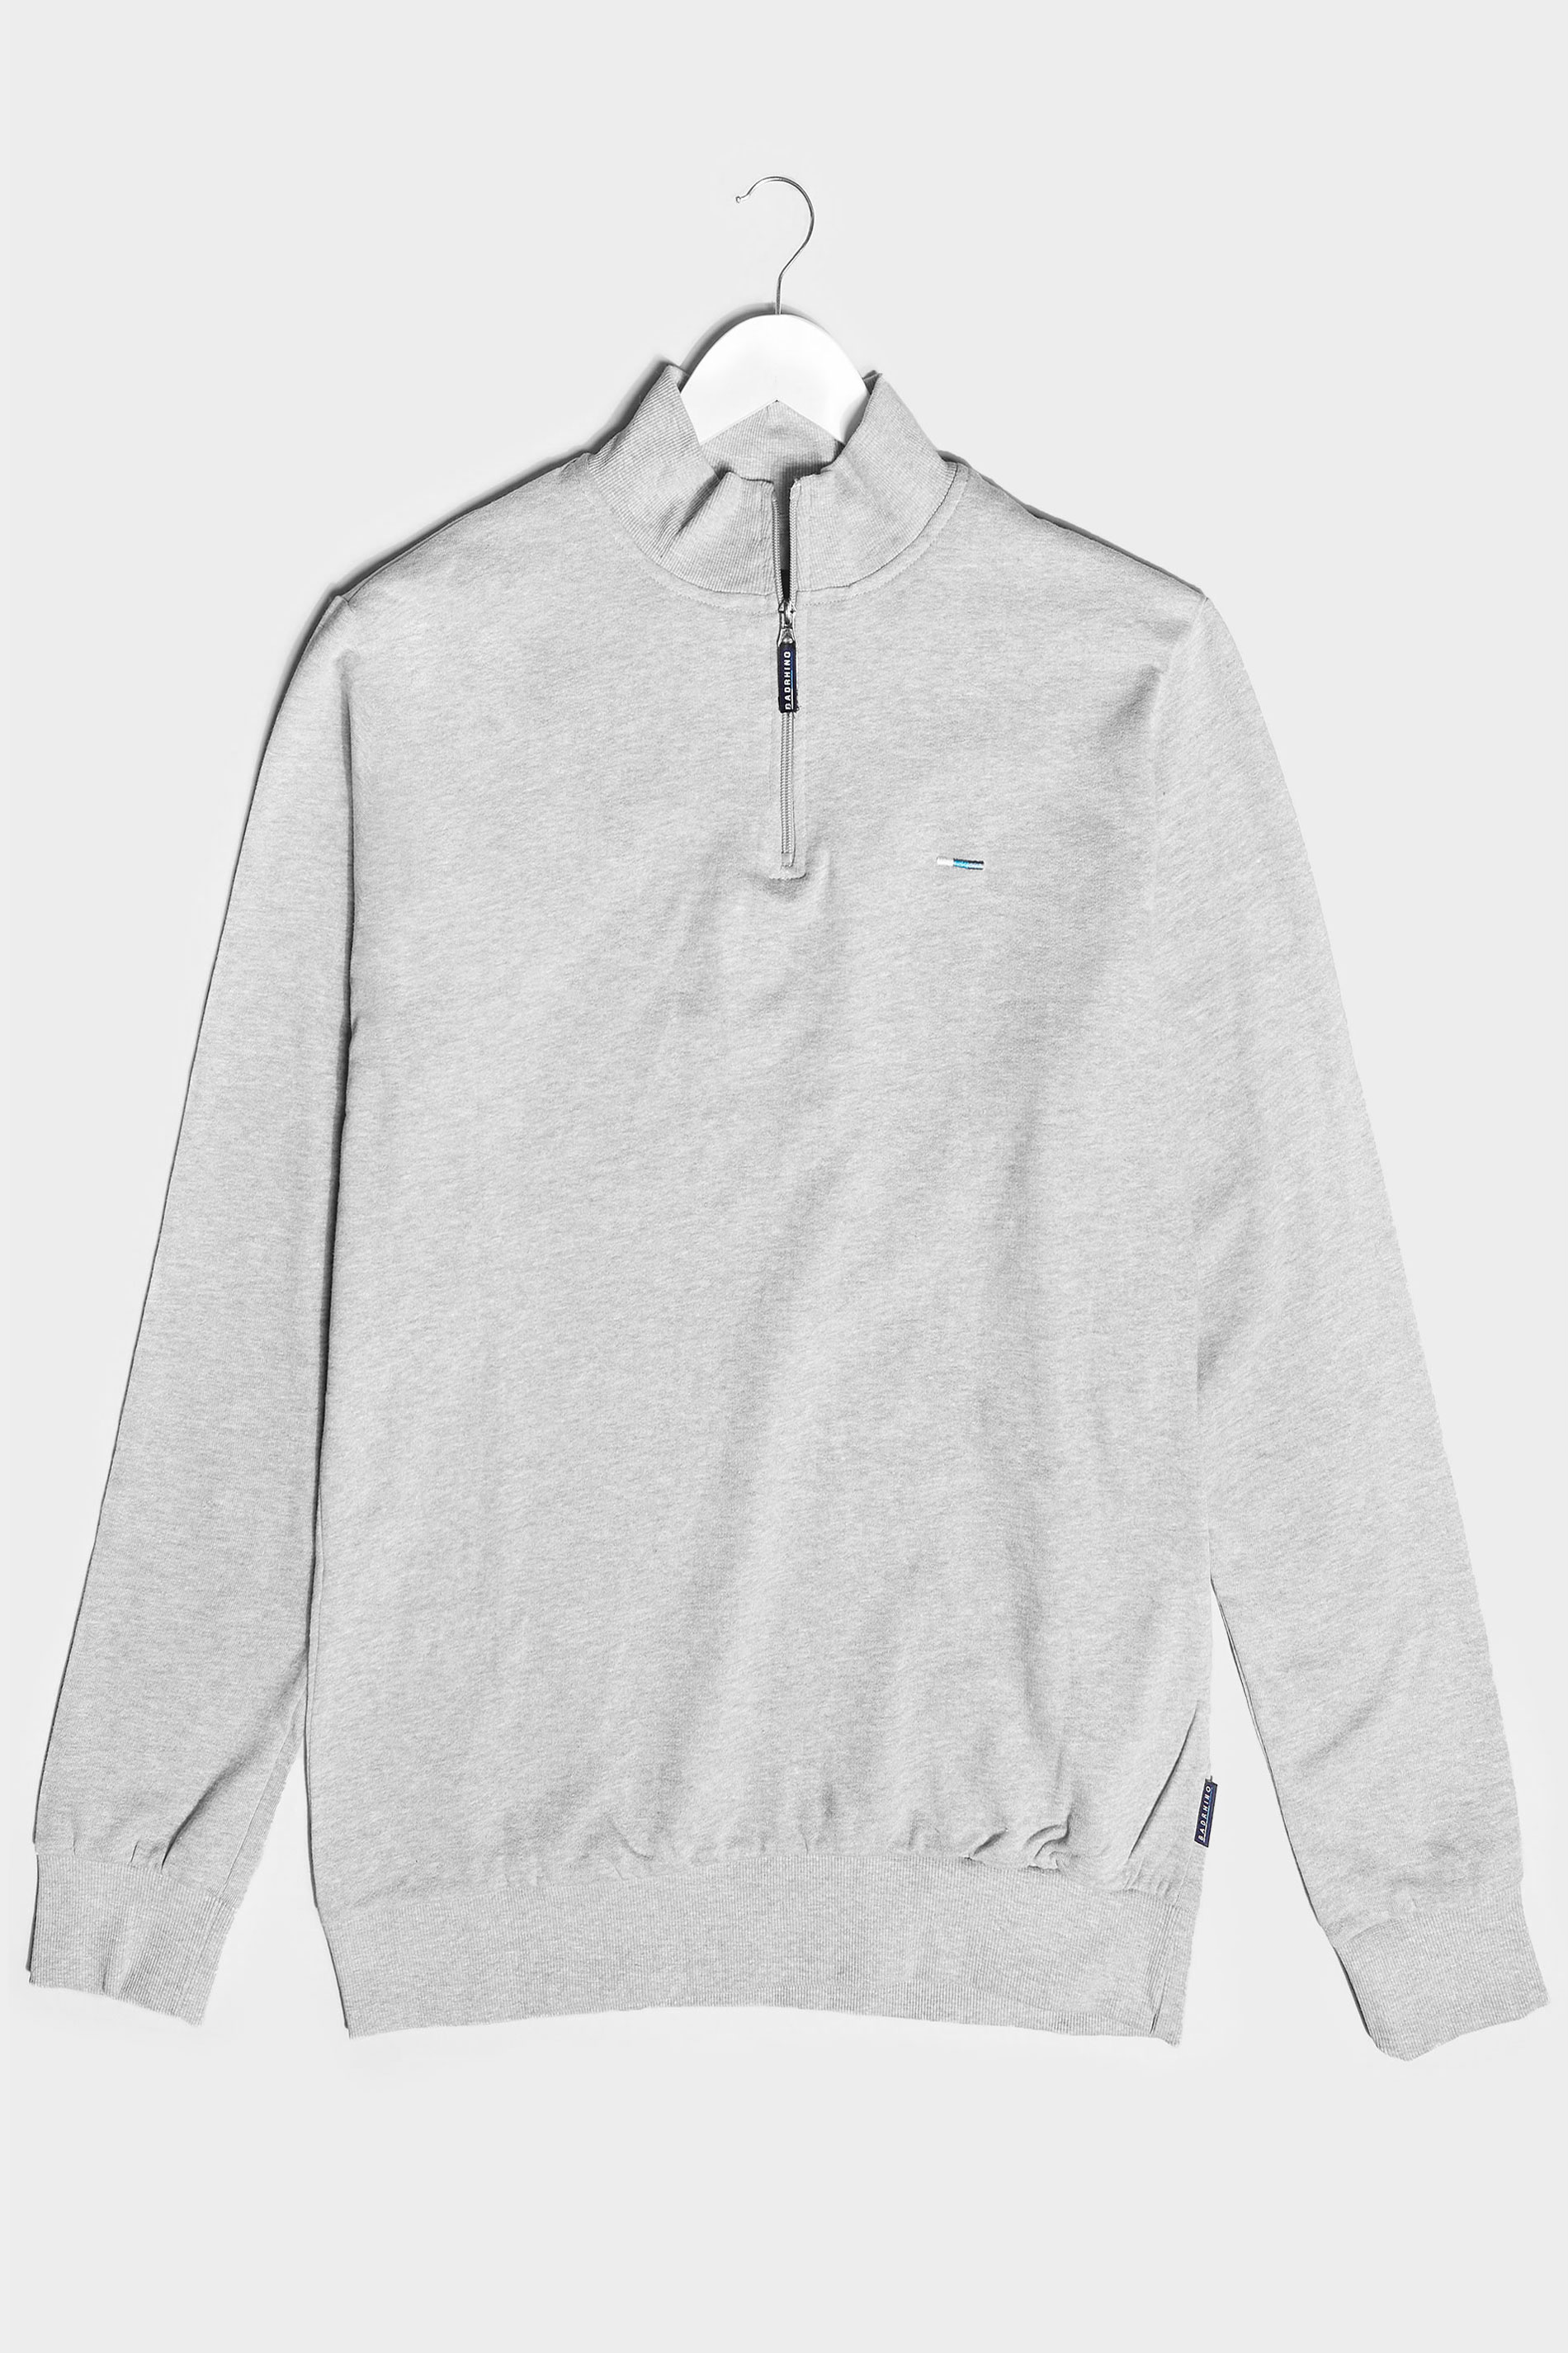 BadRhino Grey Marl Quarter Zip Essential Sweatshirt